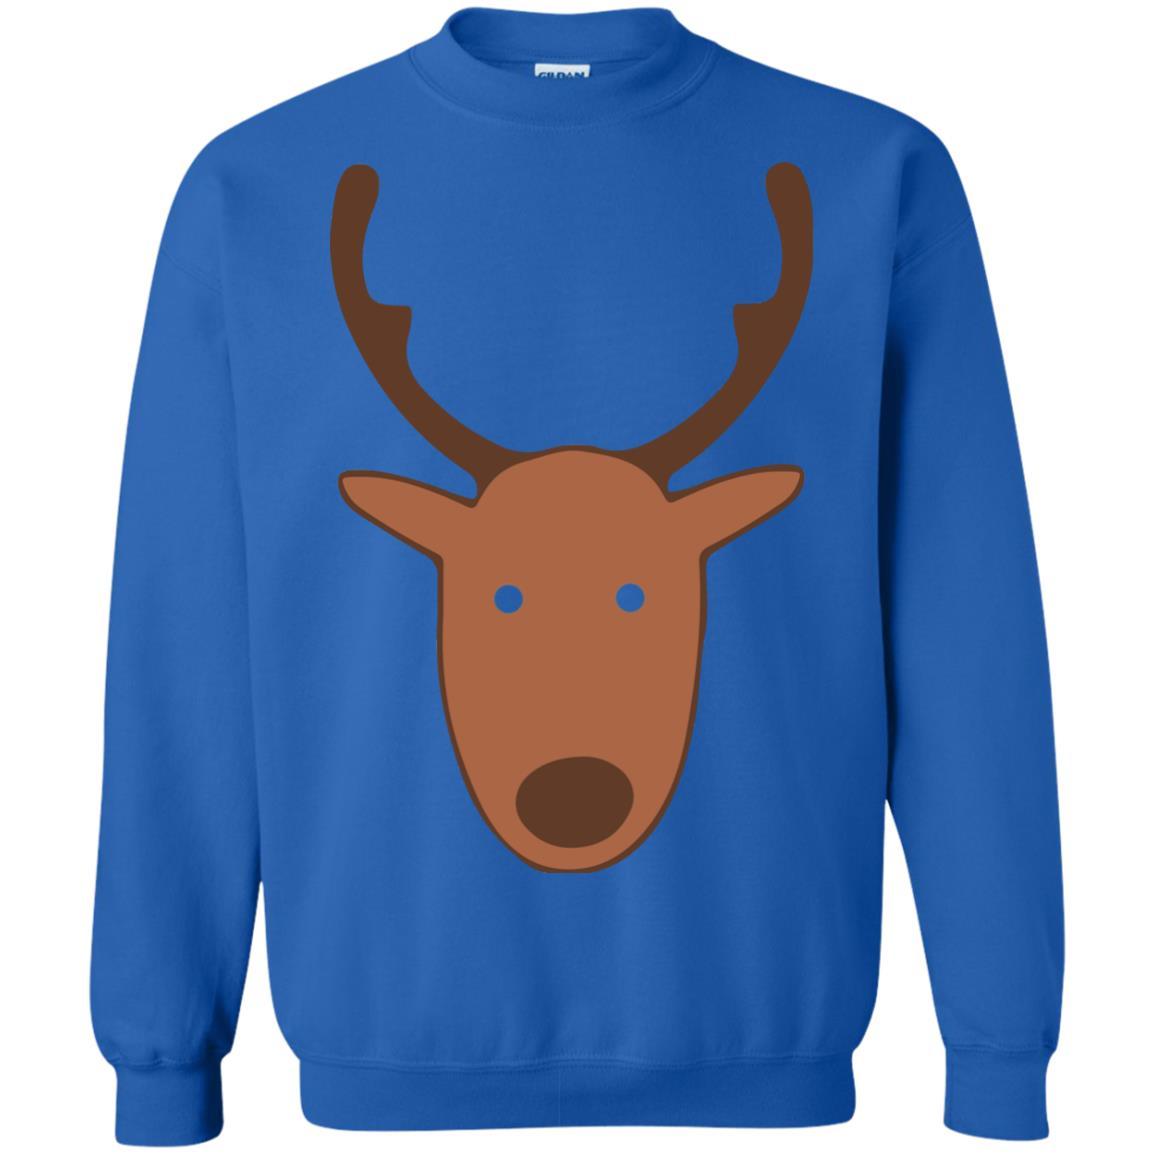 image 4777 - Tina Belcher Reindeer Christmas Sweater, Shirt, Hoodie